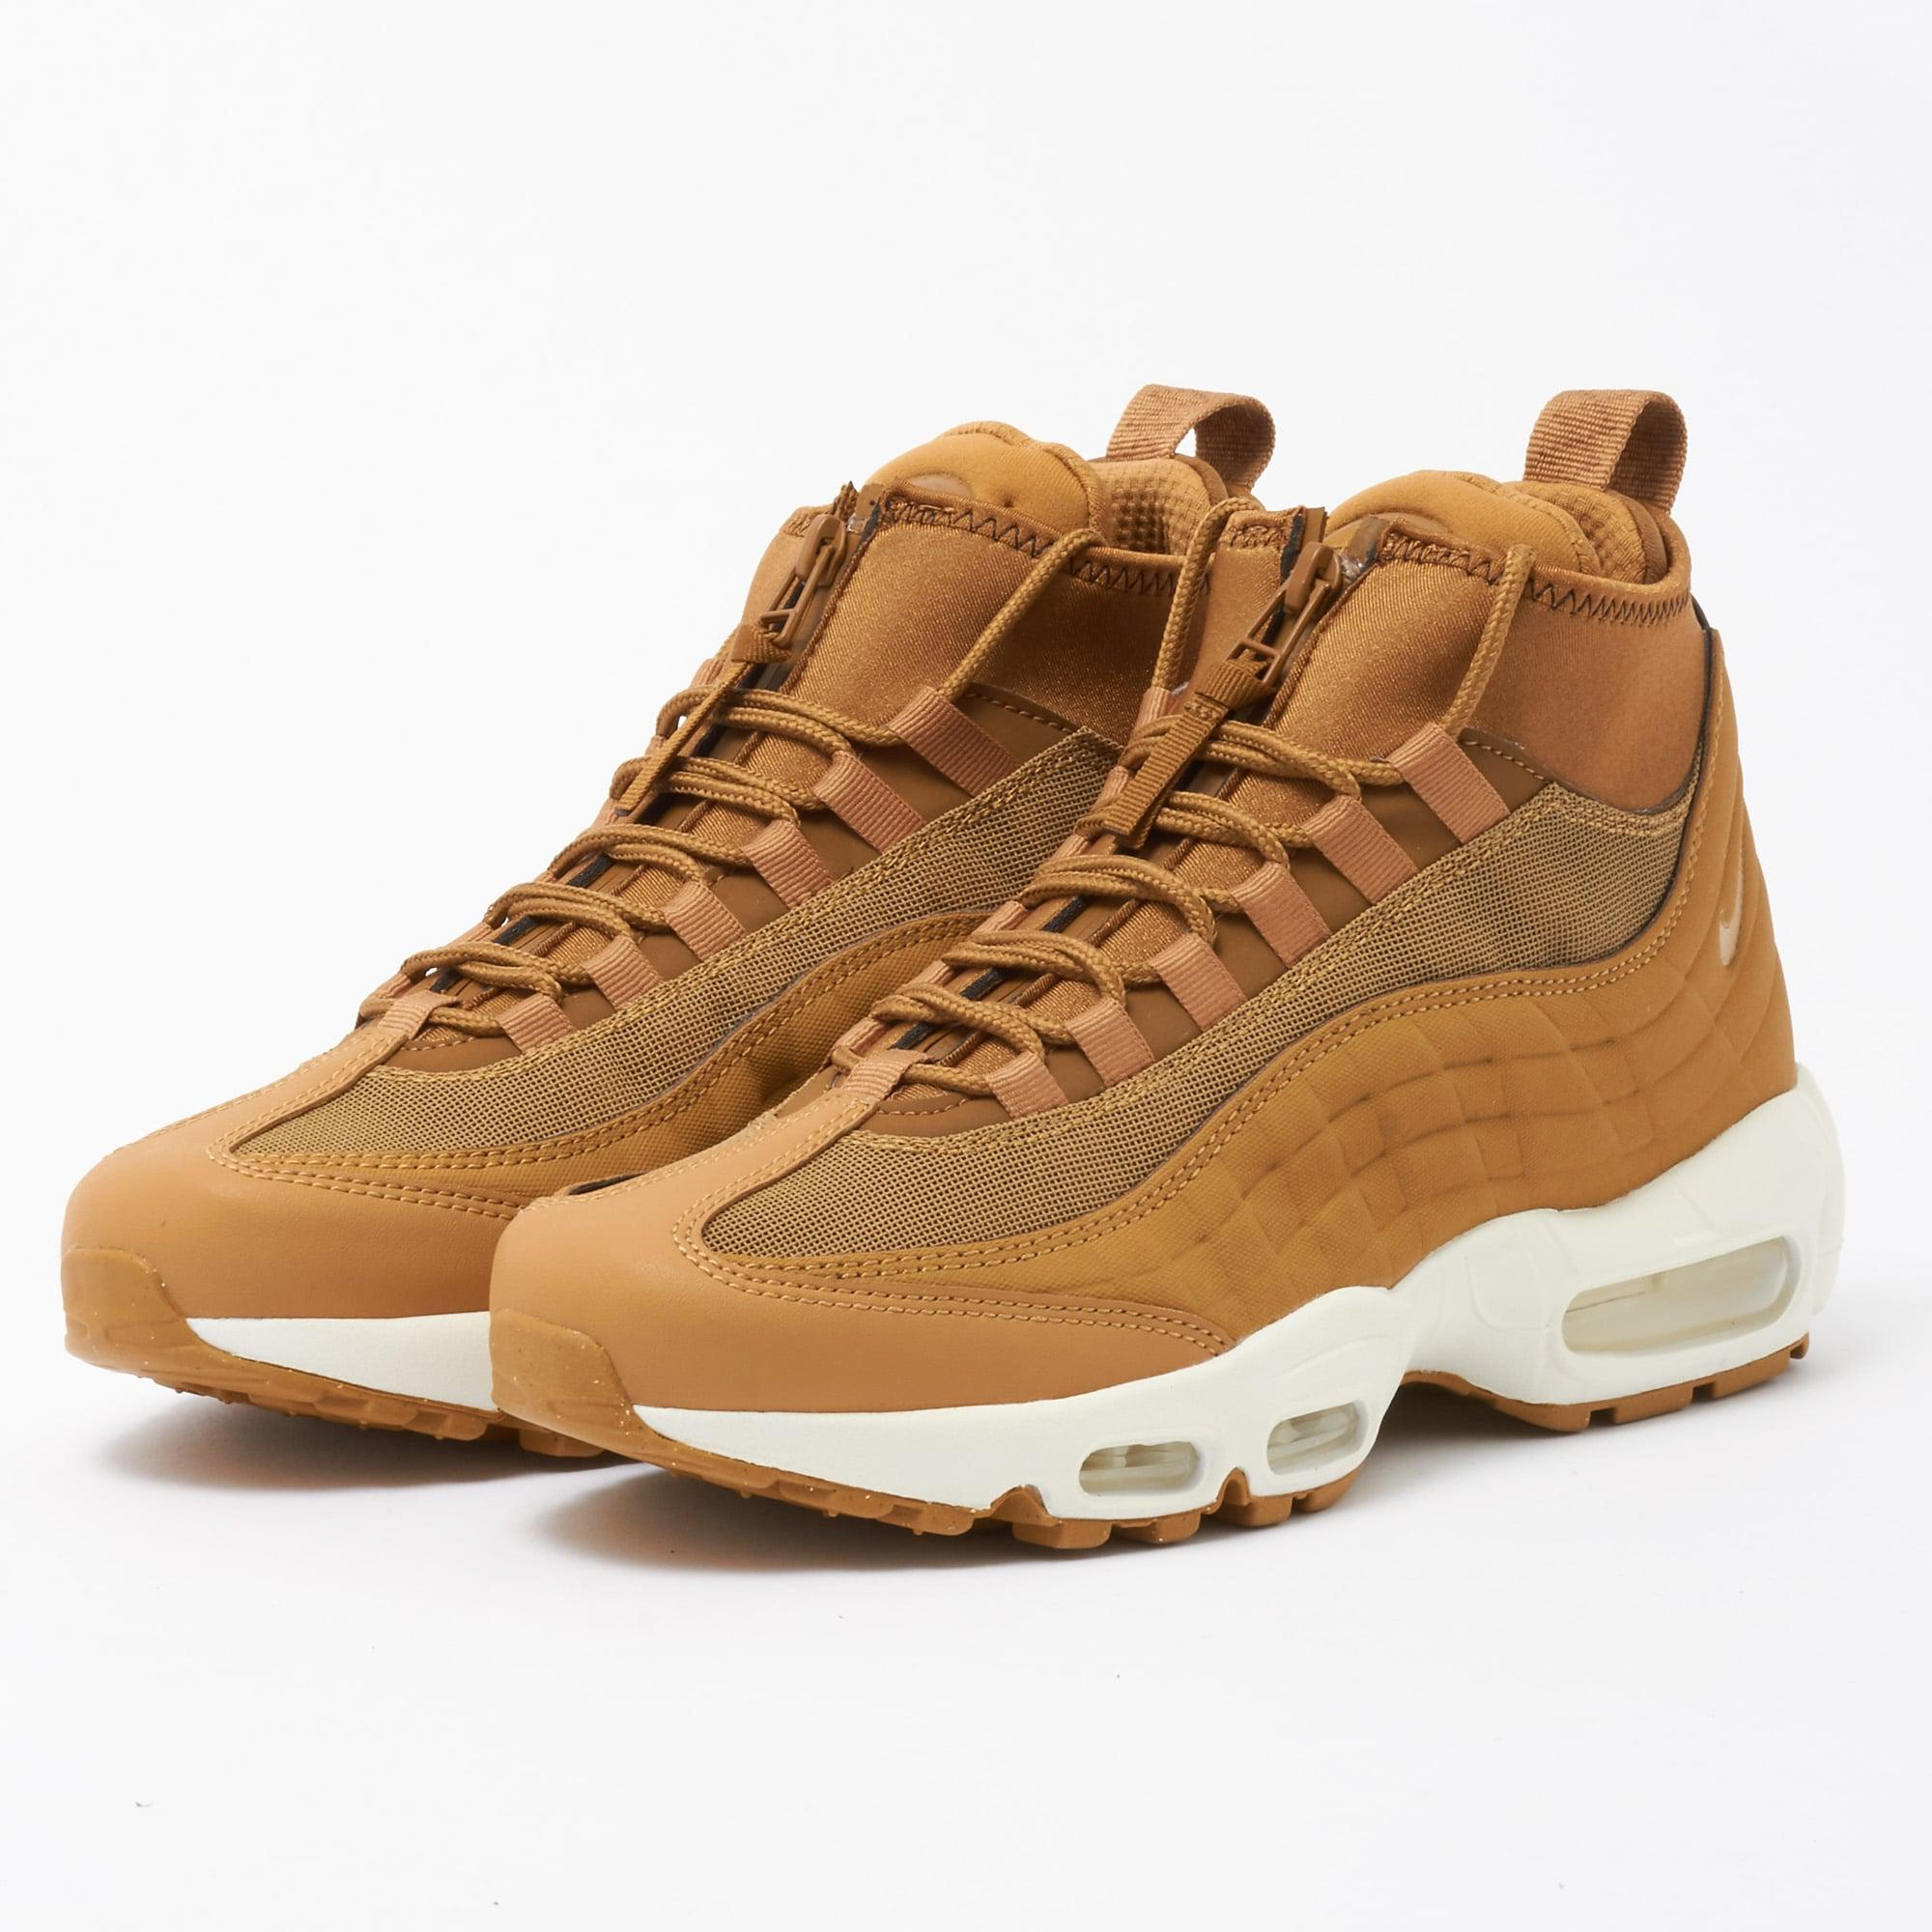 best website 45903 dc83c Nike Air Max 95 Sneakerboot - Flax for Men - Lyst